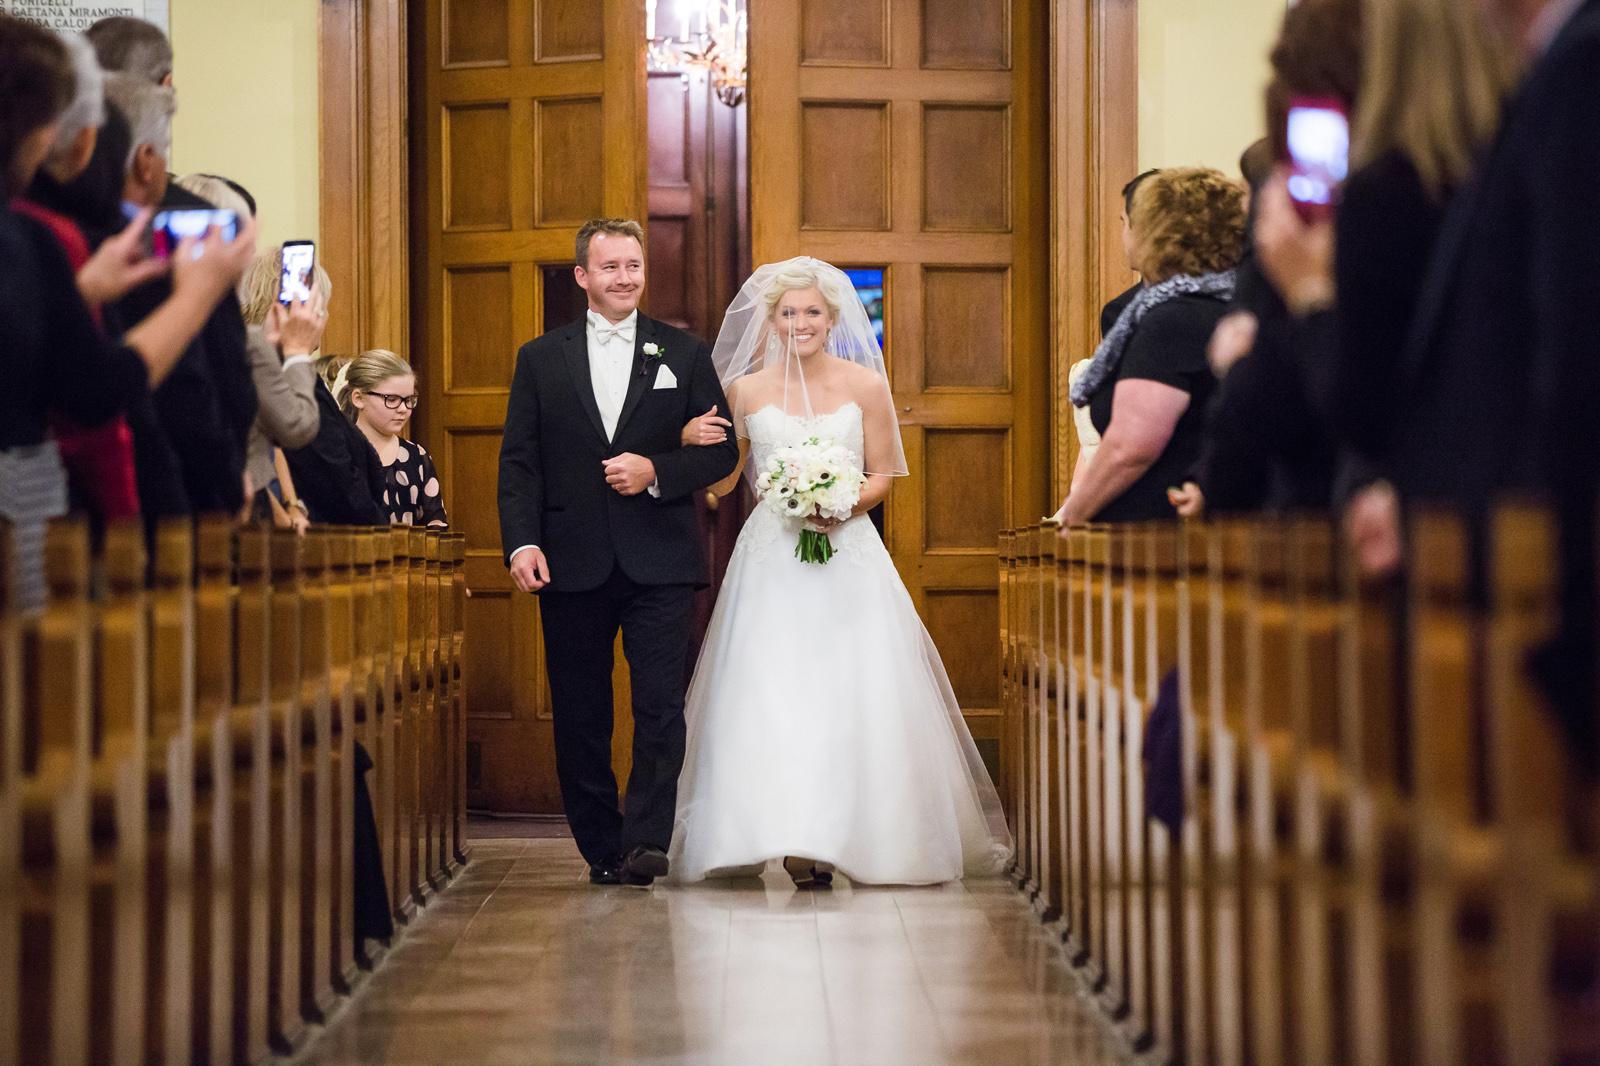 St Ambrose Hll Wedding_20141115_15000590.jpg